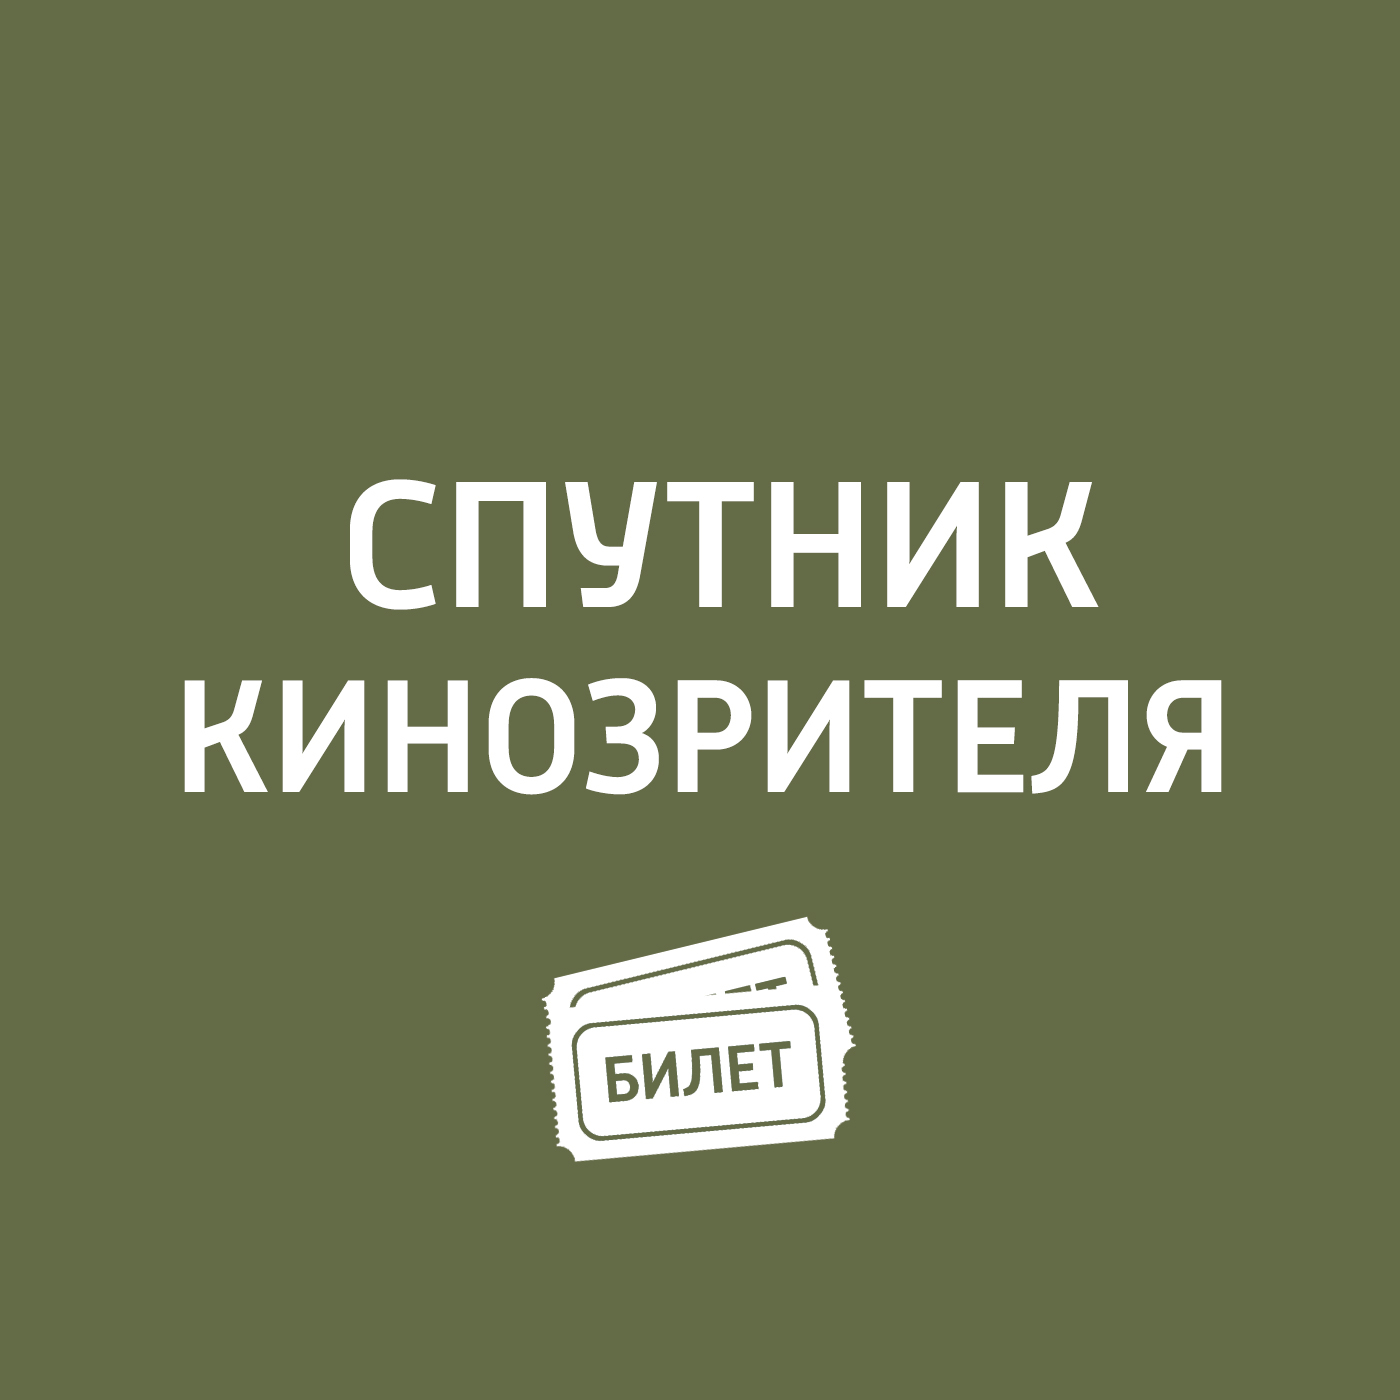 Антон Долин Тарковский и Кубрик